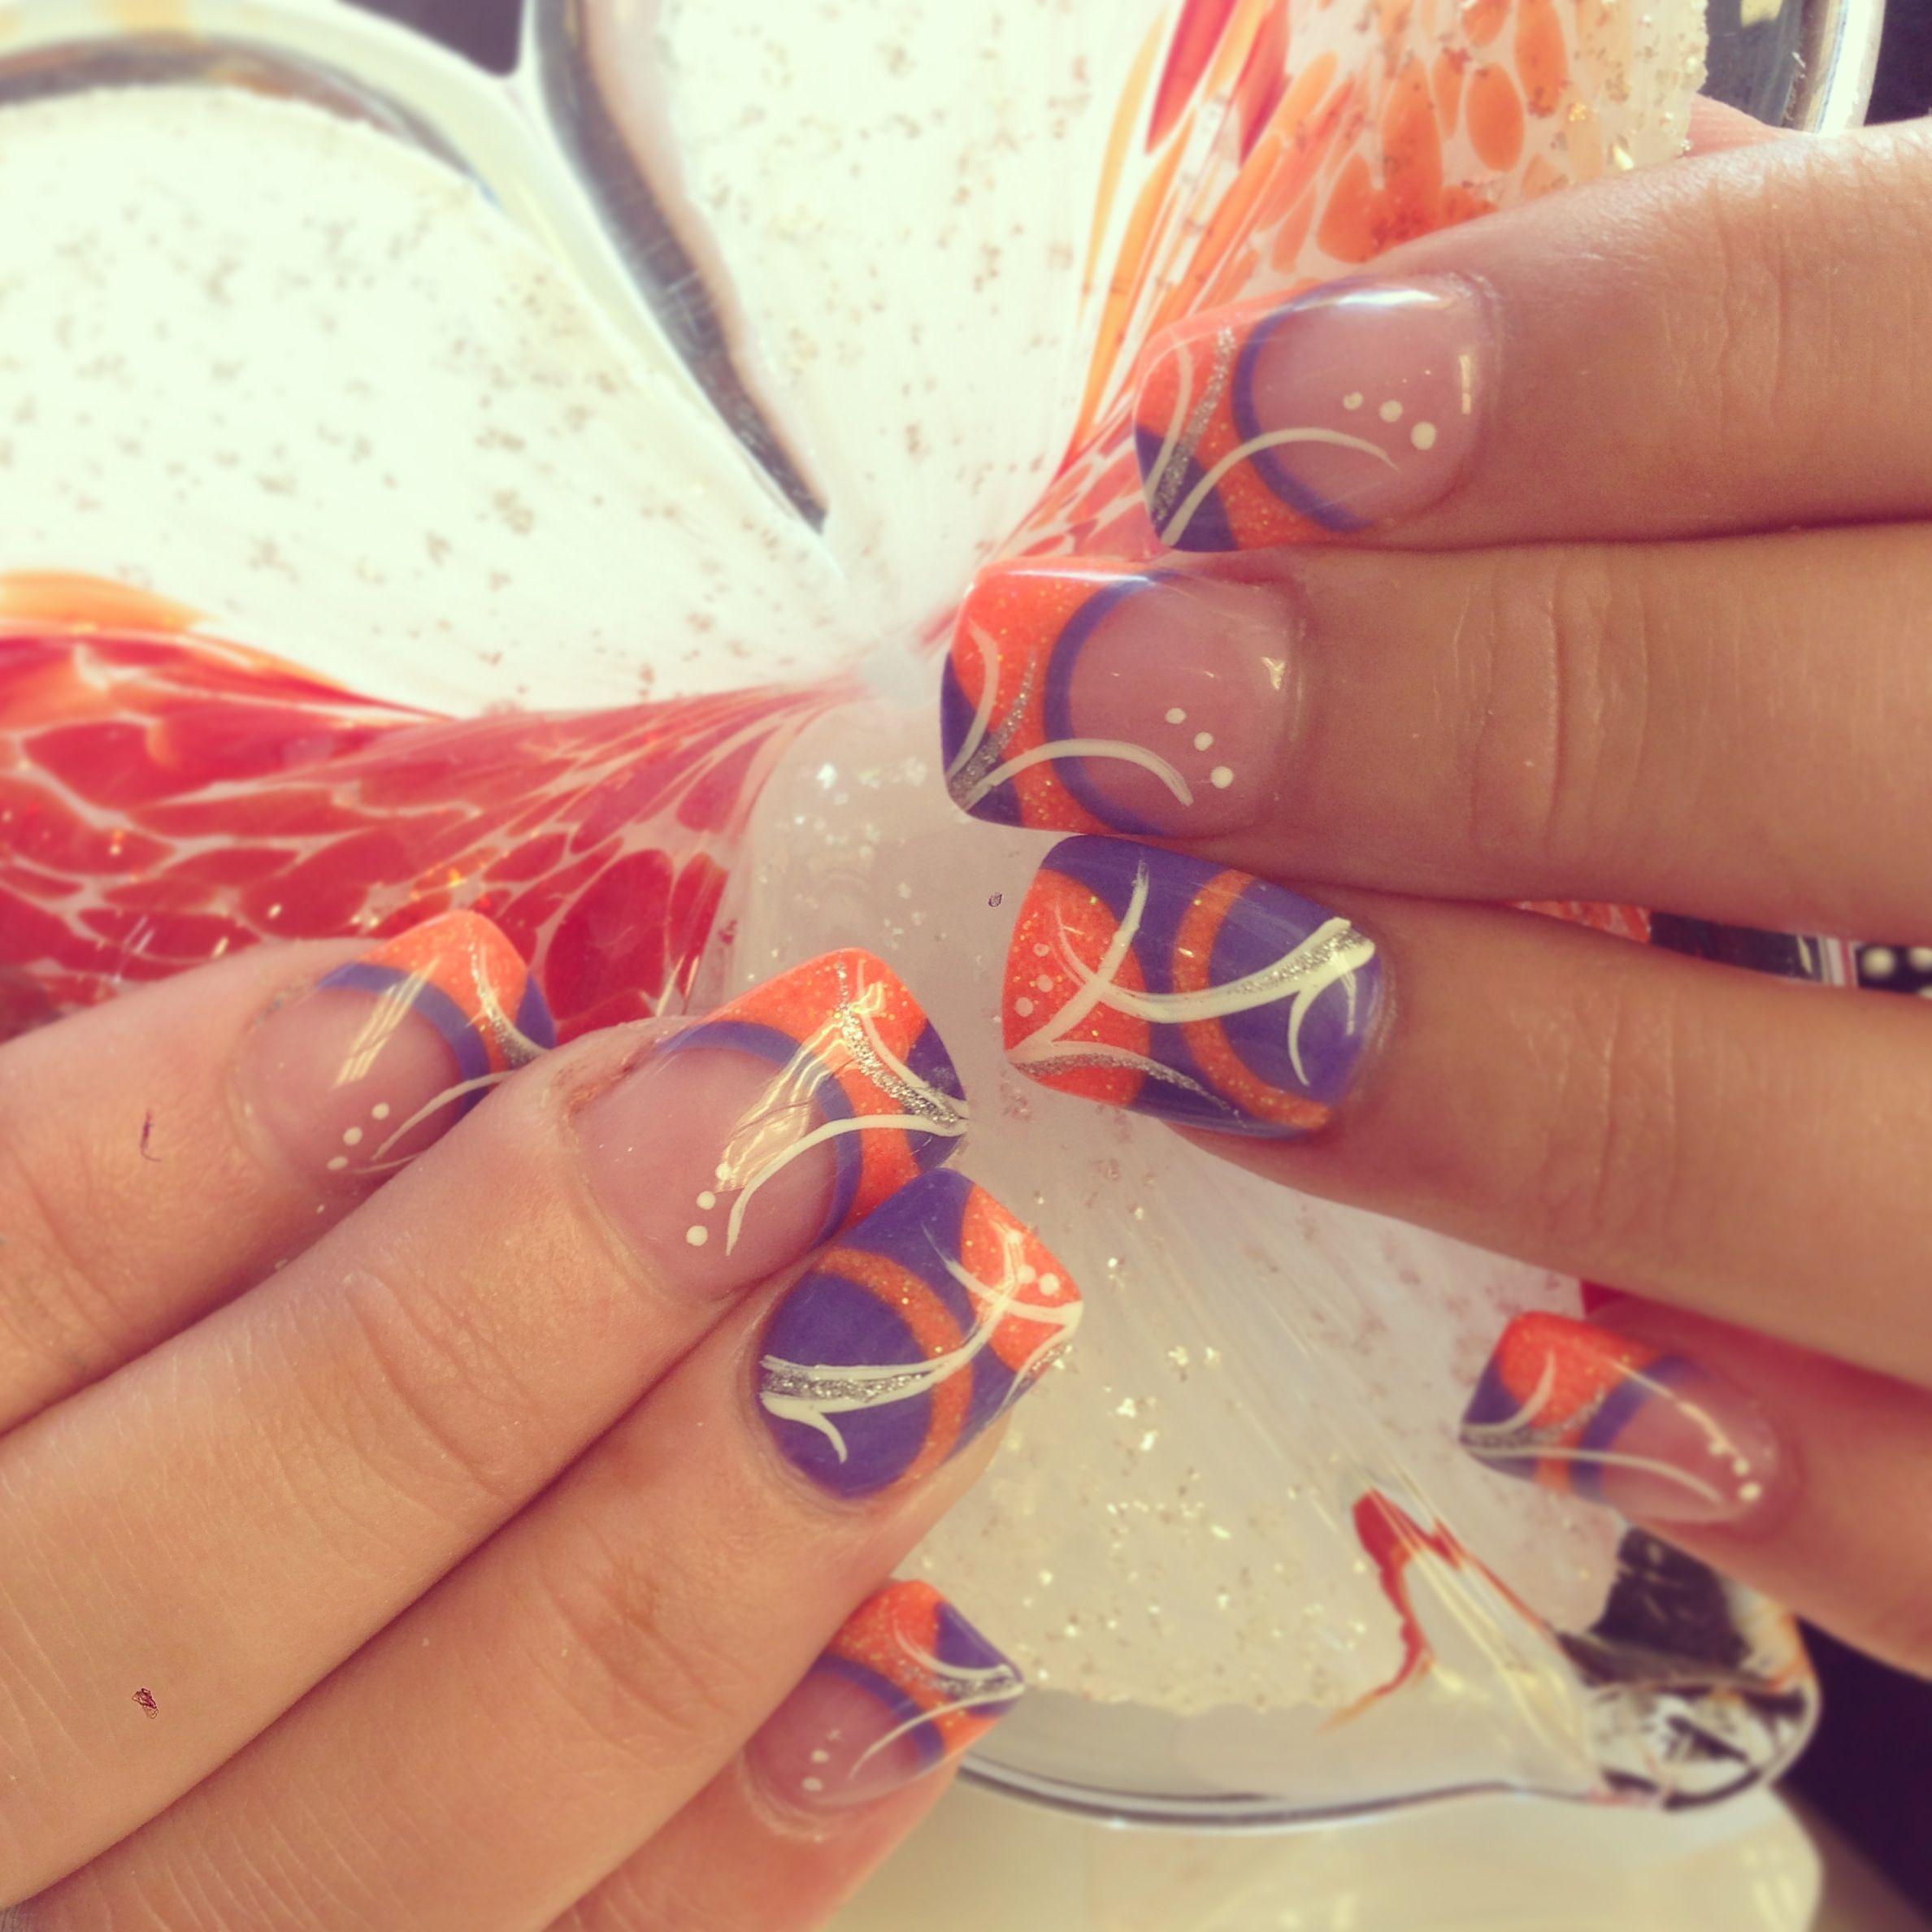 Happy Summer Nails Orange And Purple Nail Design Acrylics Geometric Circular French Purple Nail Designs Purple Nails French Nails